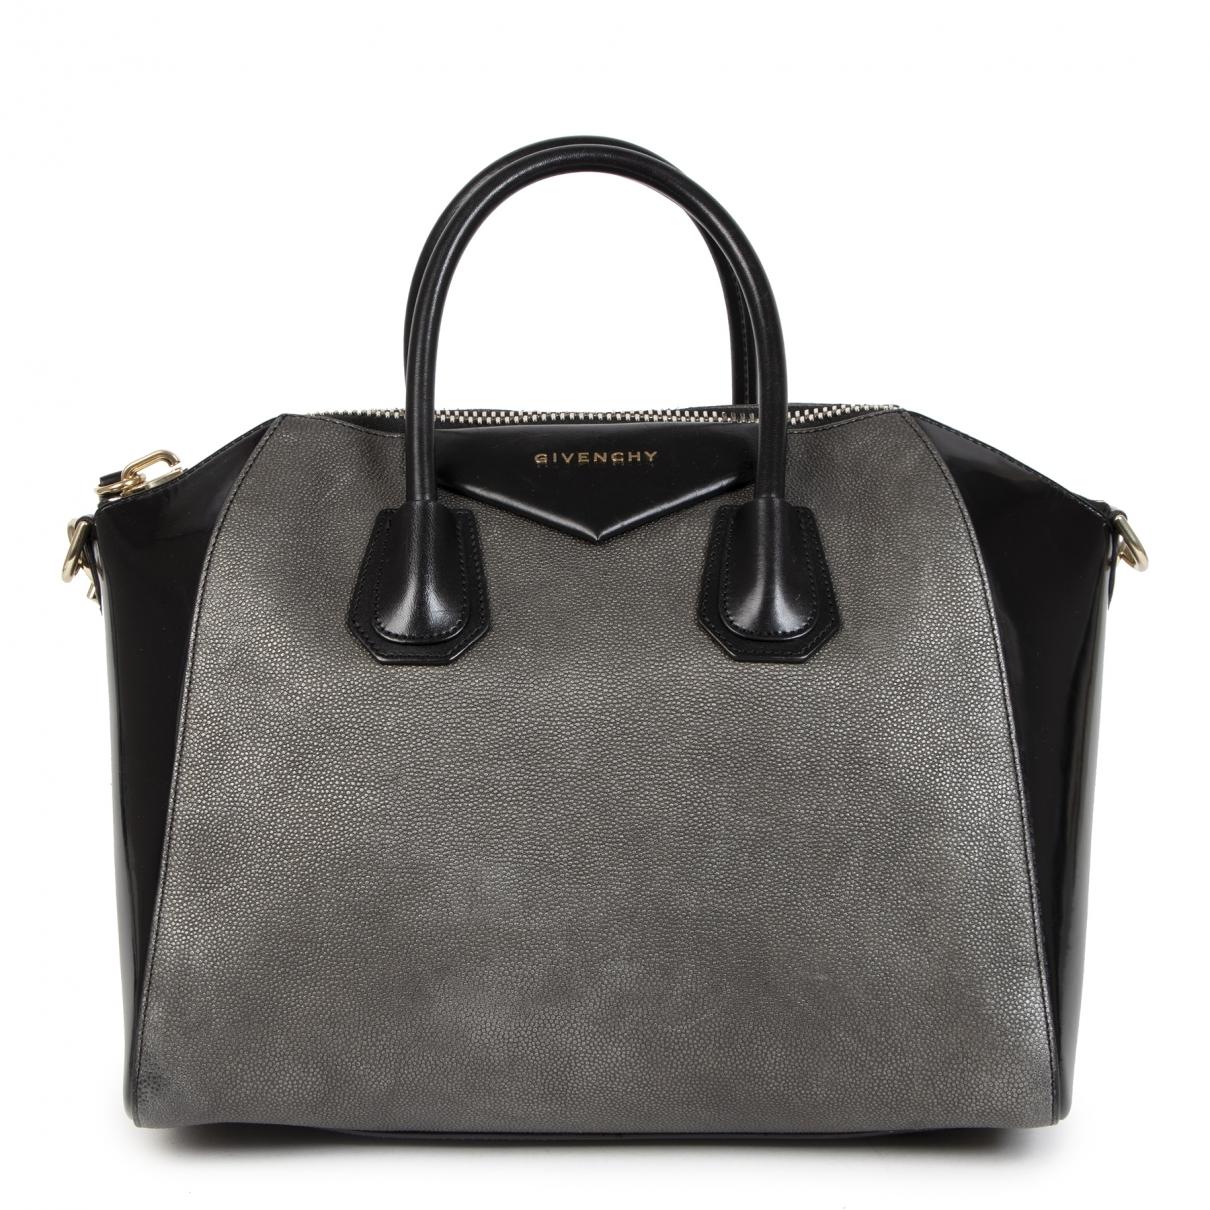 Givenchy Antigona Handtasche in  Grau Lackleder